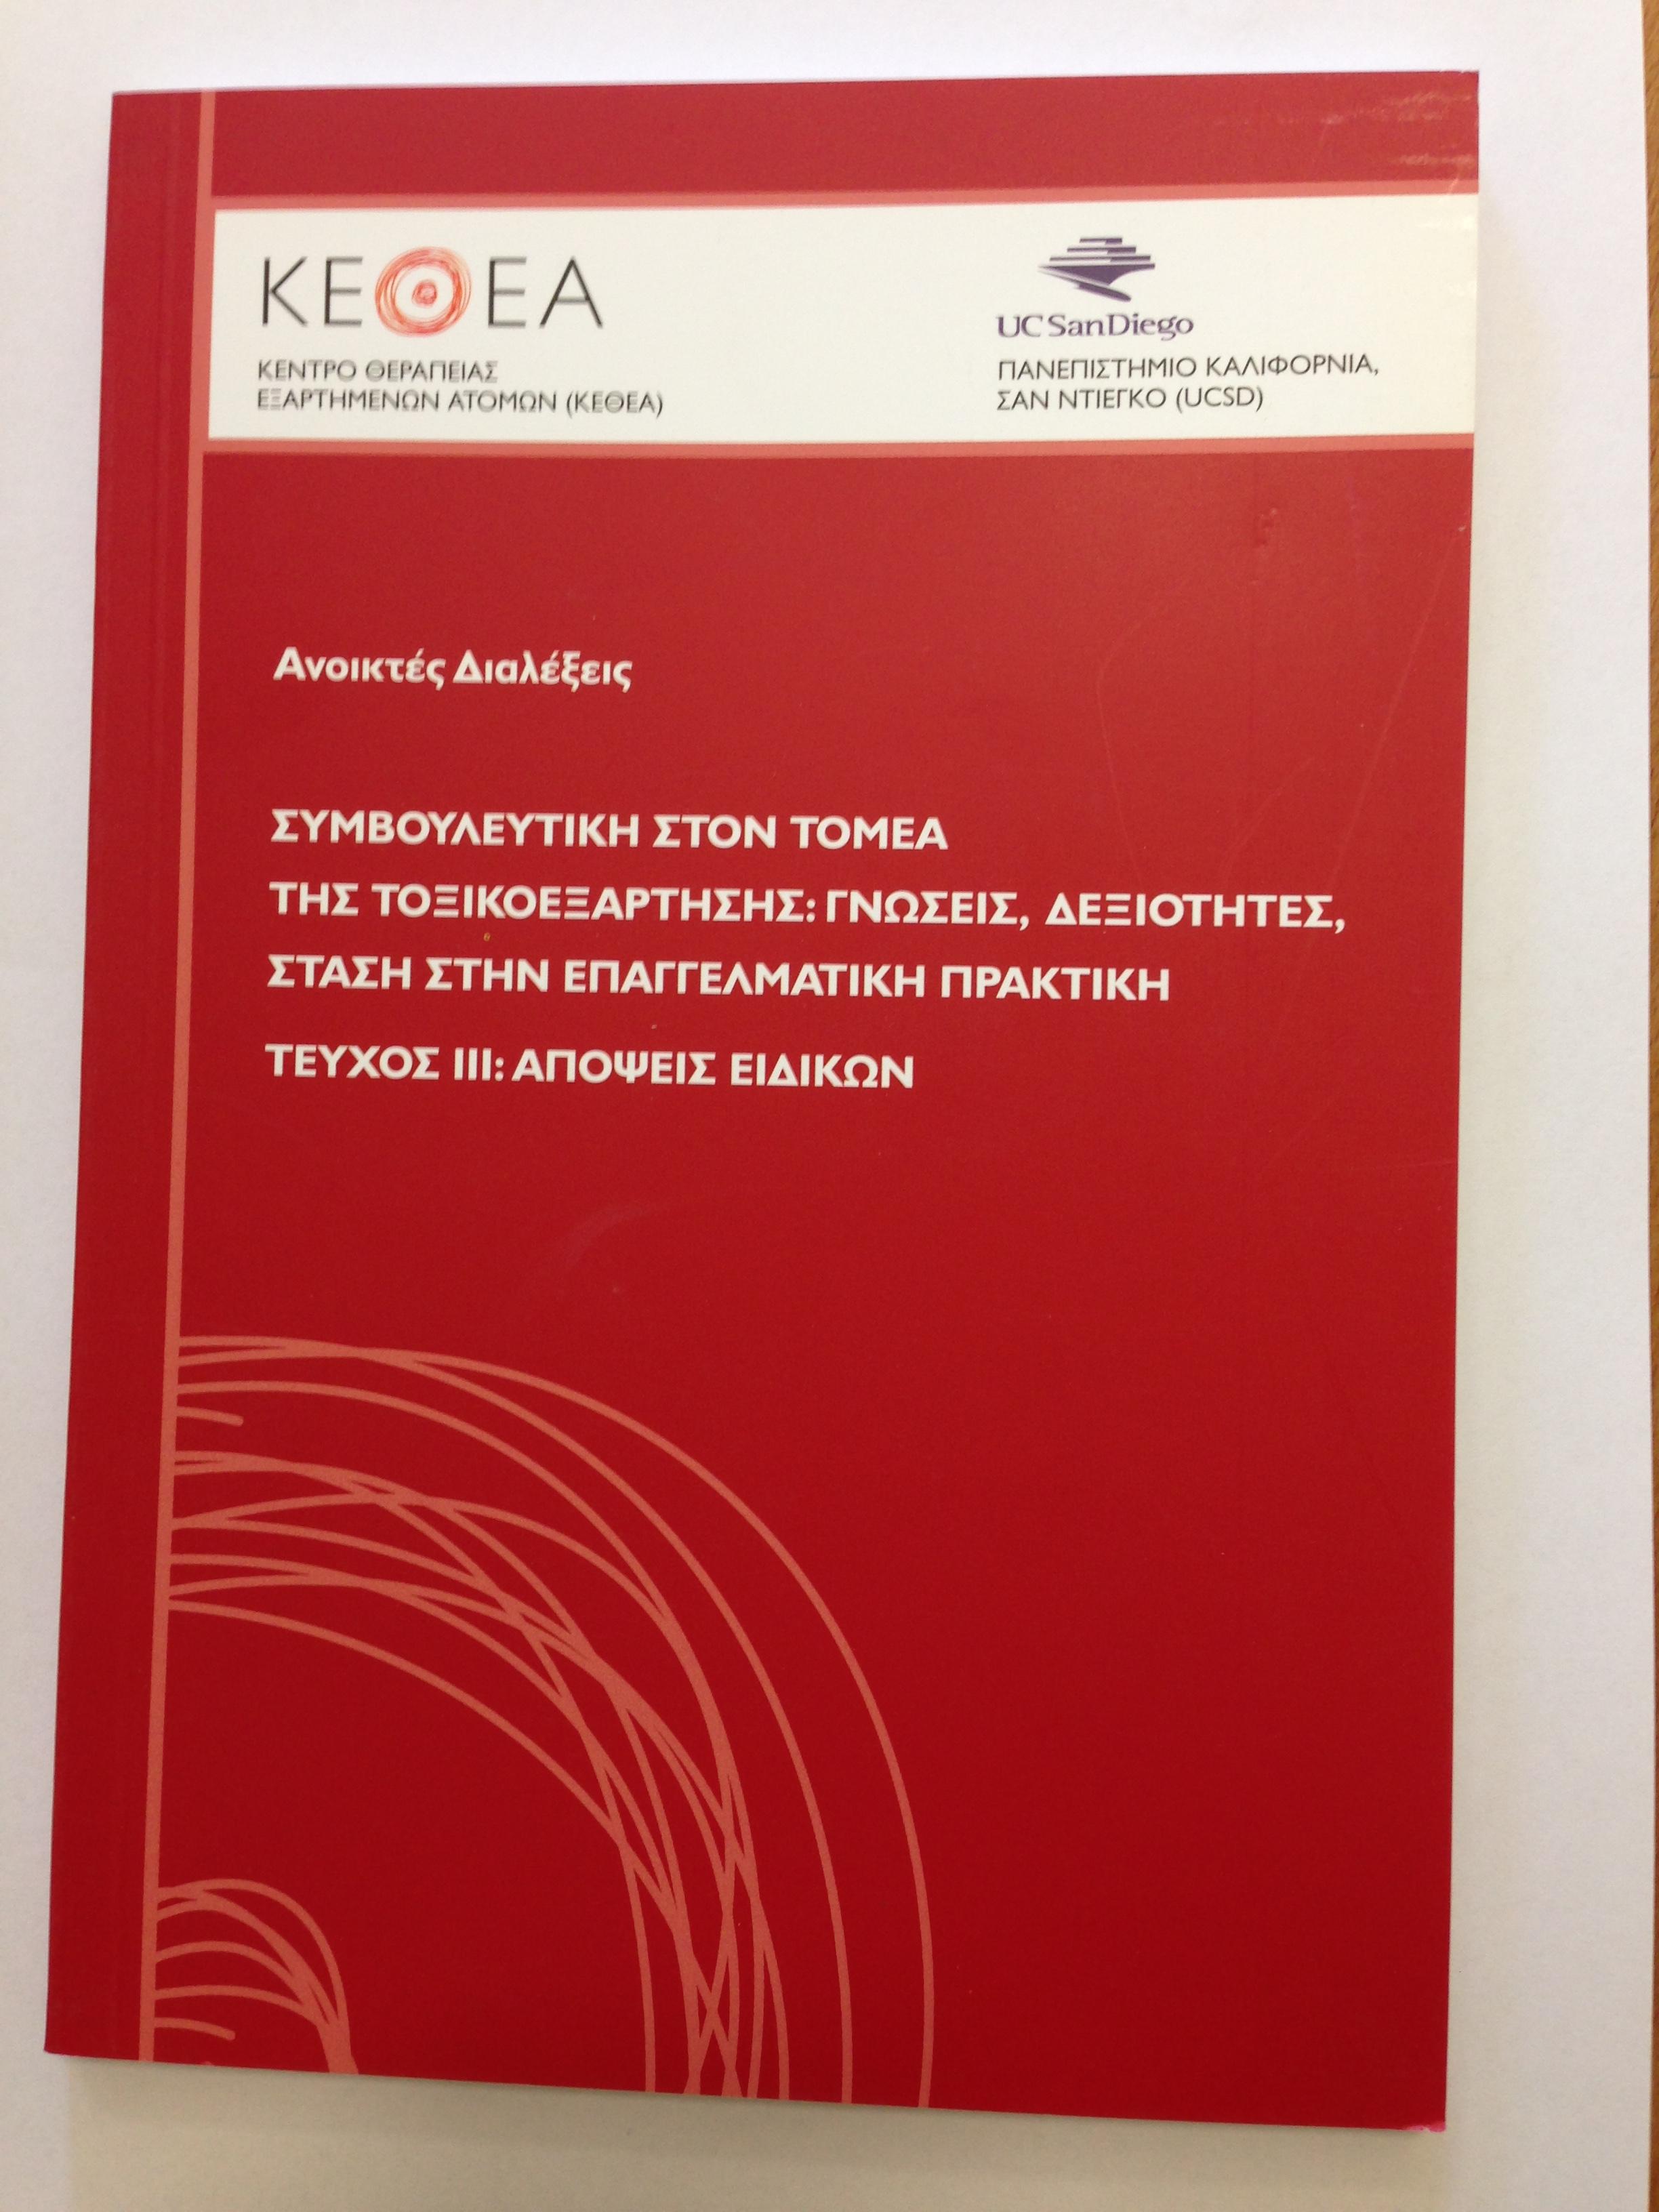 KETHEA_Editions004